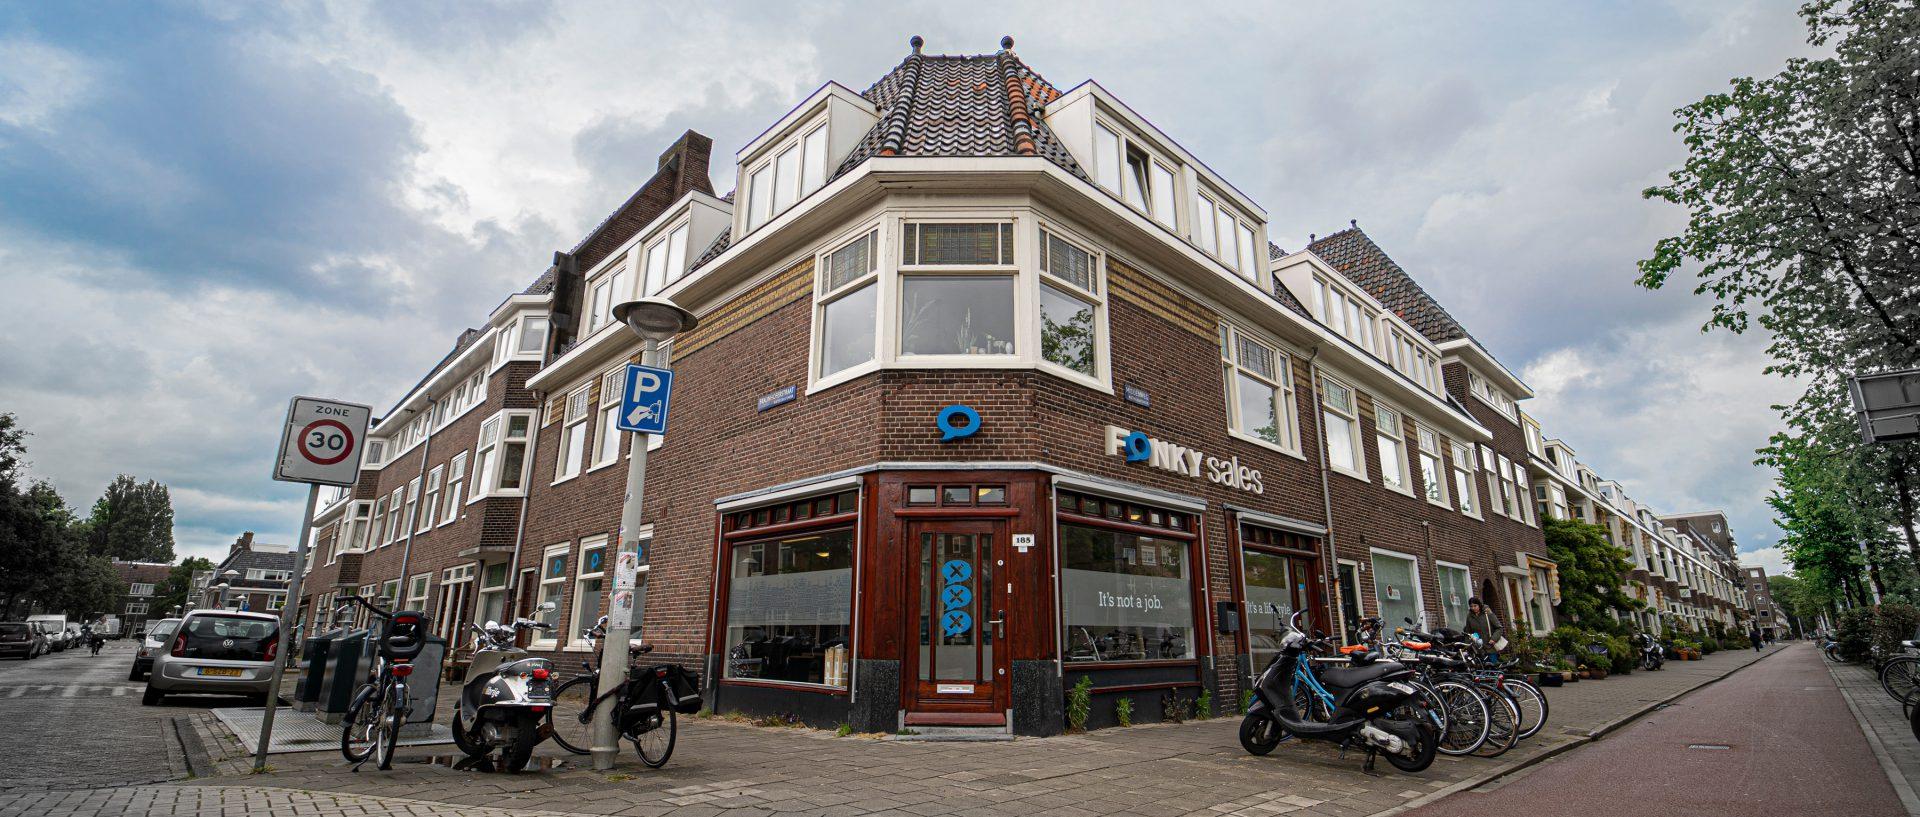 Pand bijbaan Amsterdam